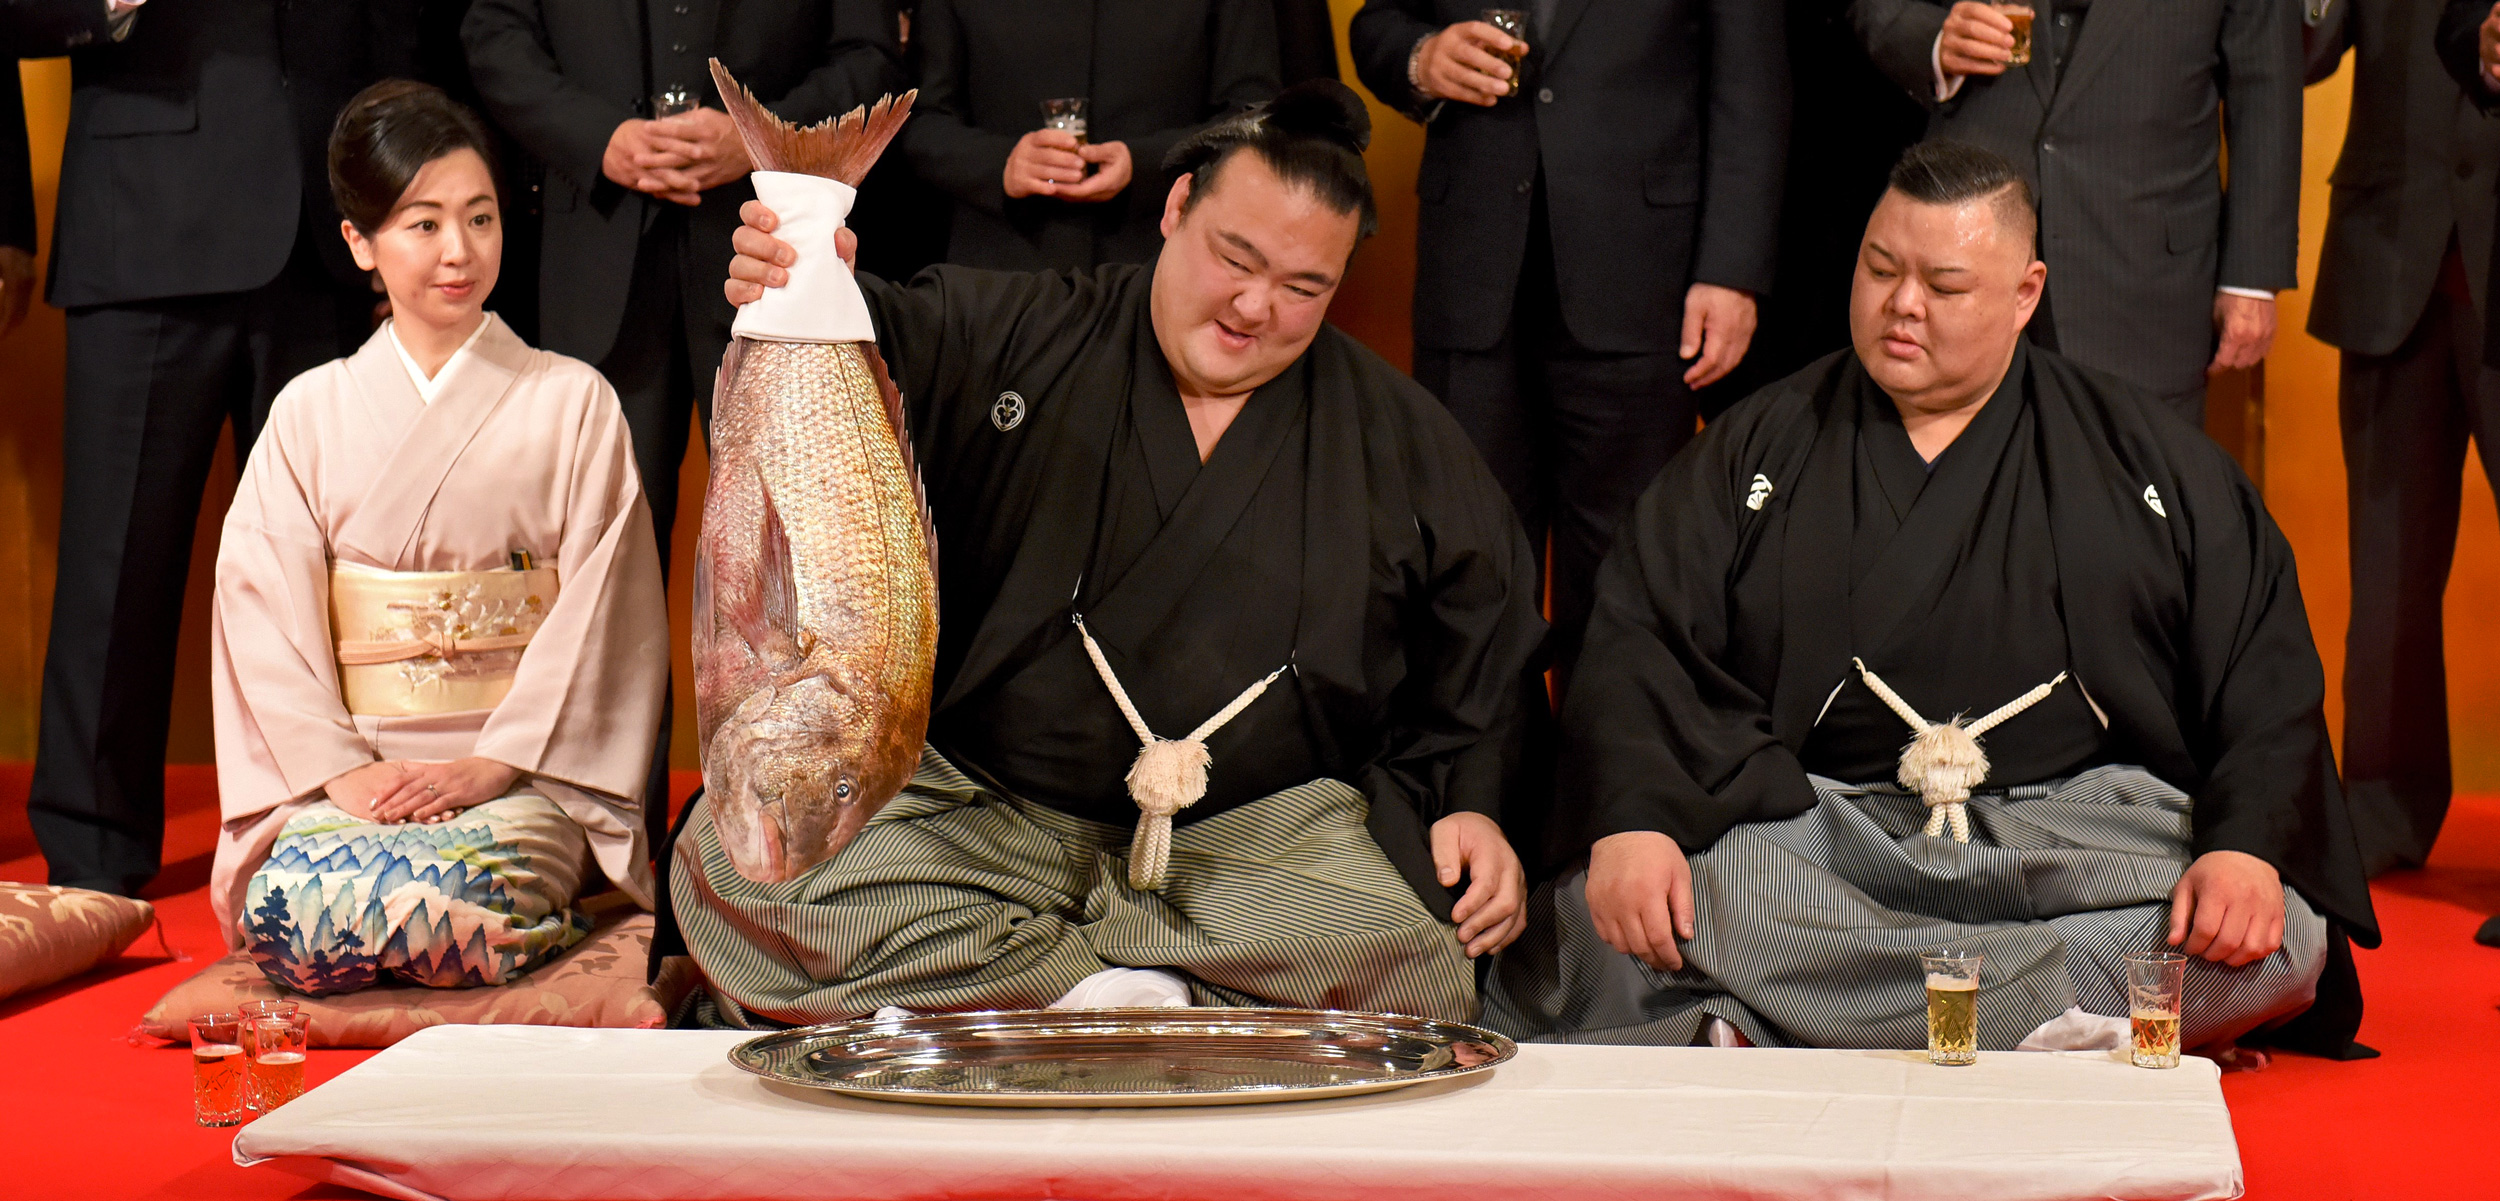 sumo wrestler Kisenosato Yutaka holds up a red seabream